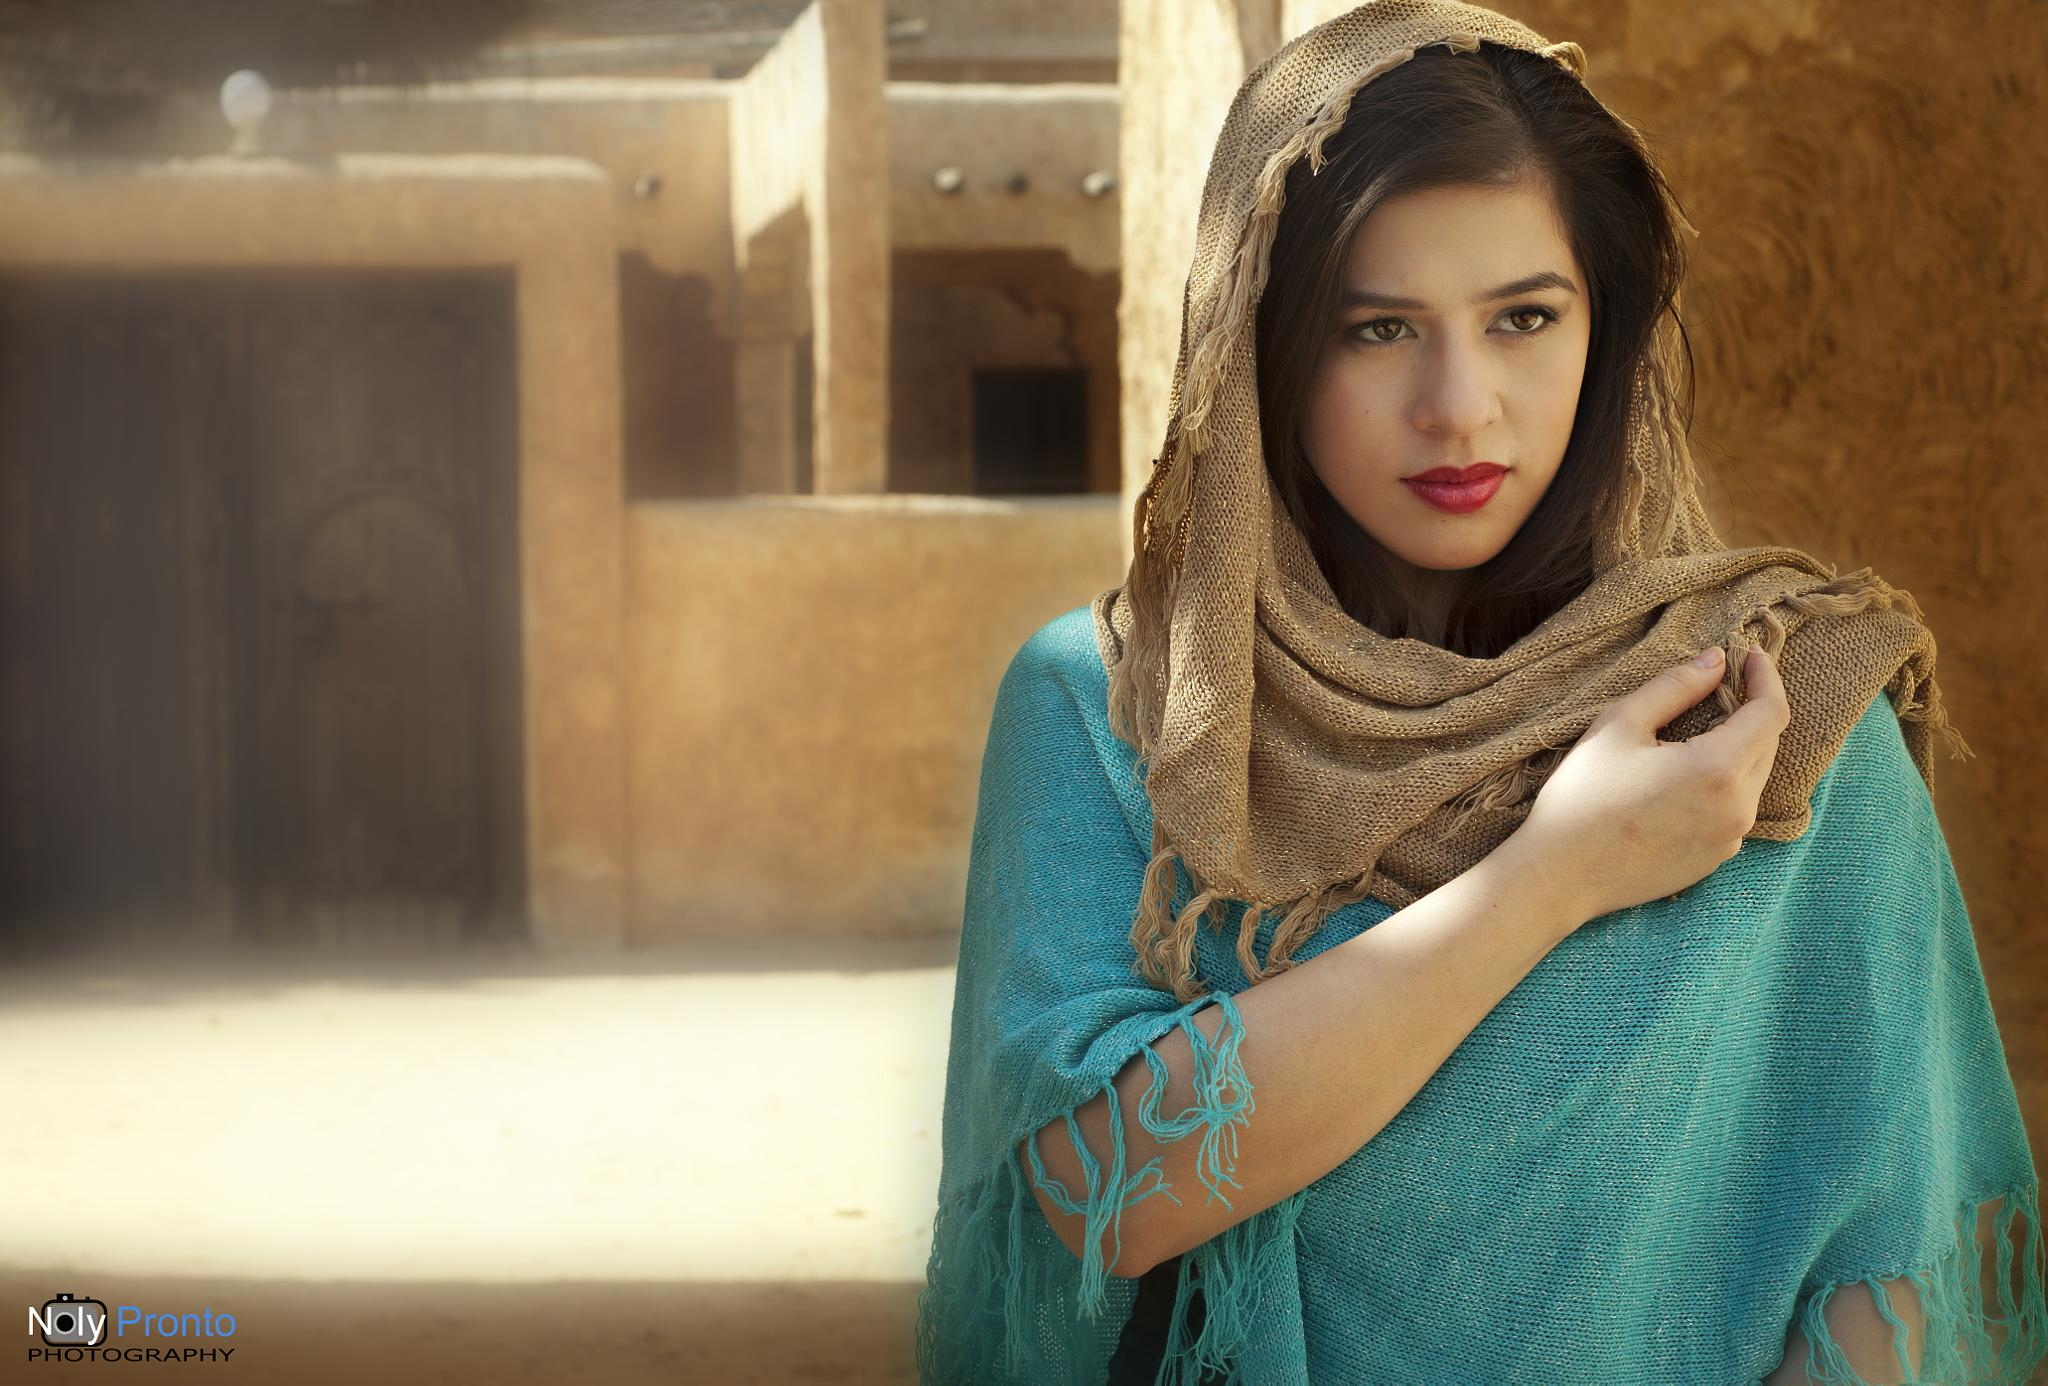 Arabian Princess by Noly Pronto Photography